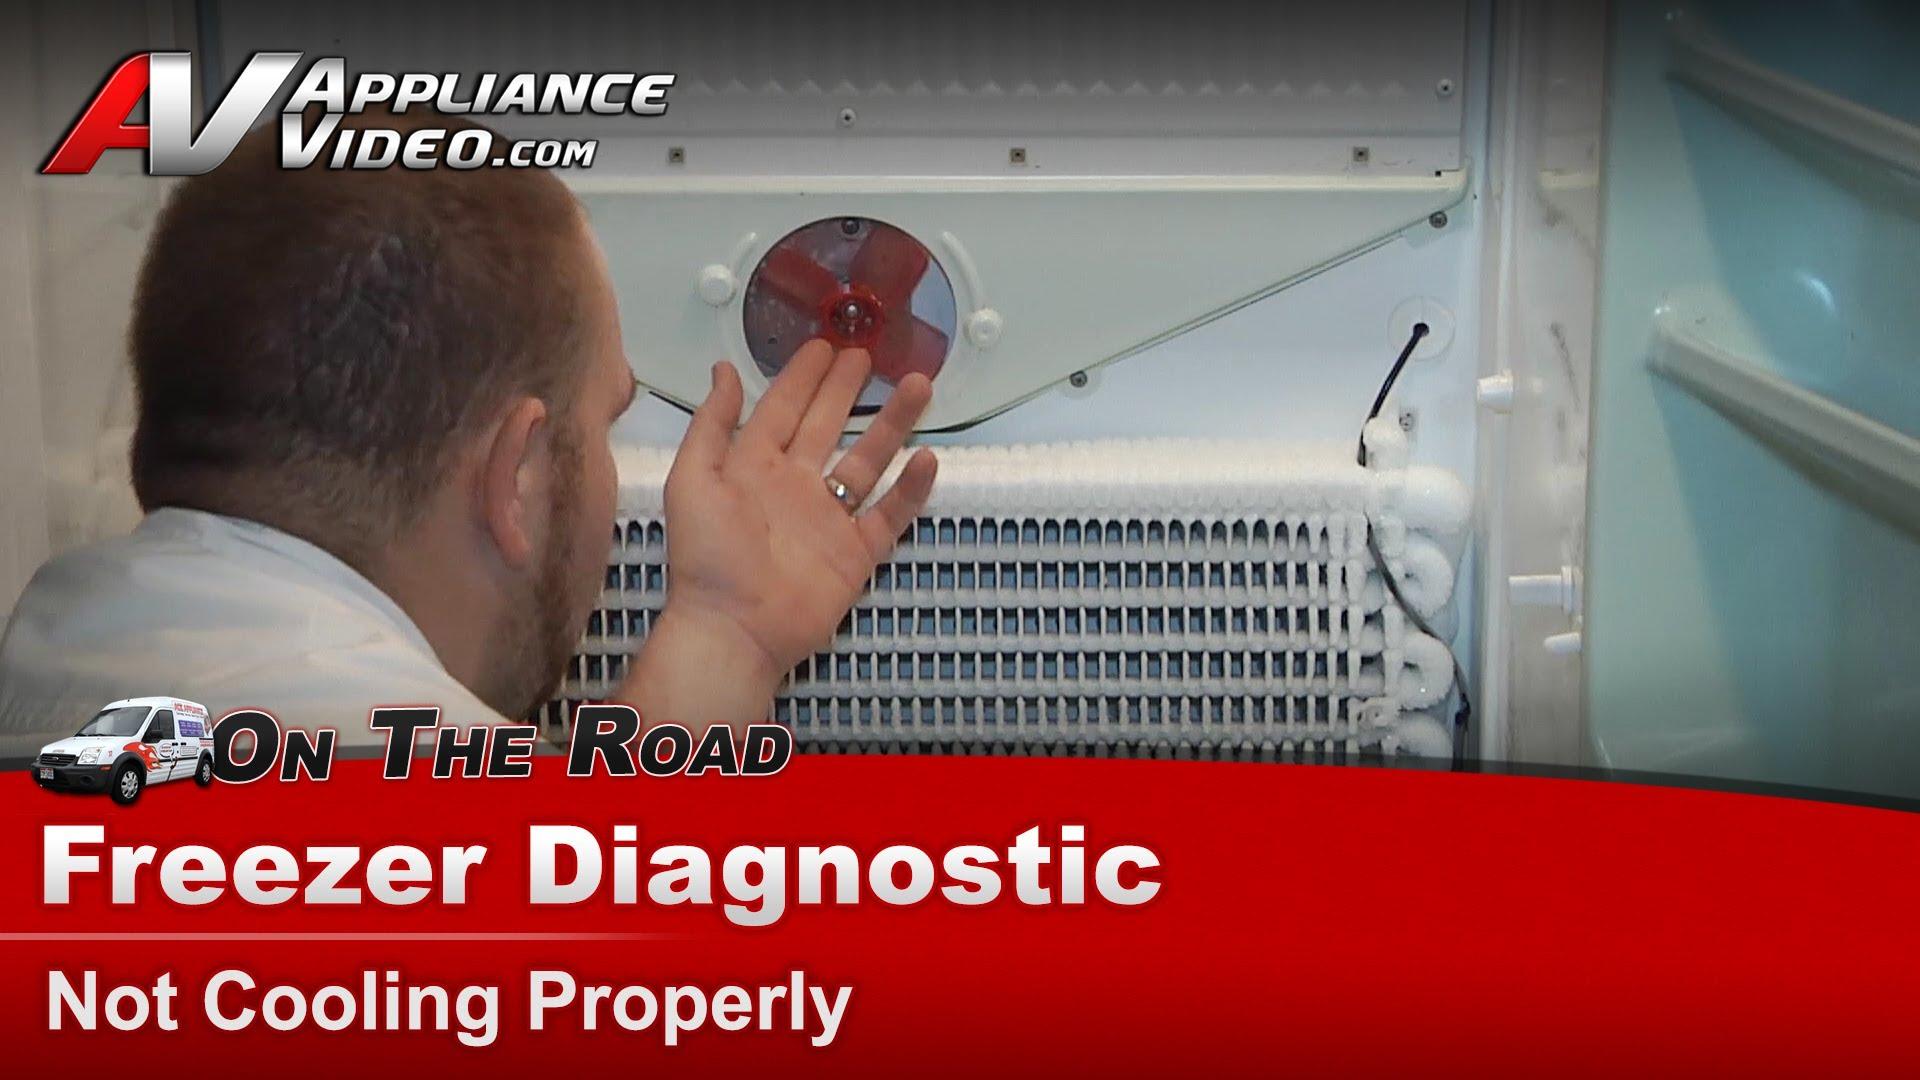 Kenmore 106724240 Freezer Diagnostic Not Cooling Properly Evaporator Fan Motor Liance Video